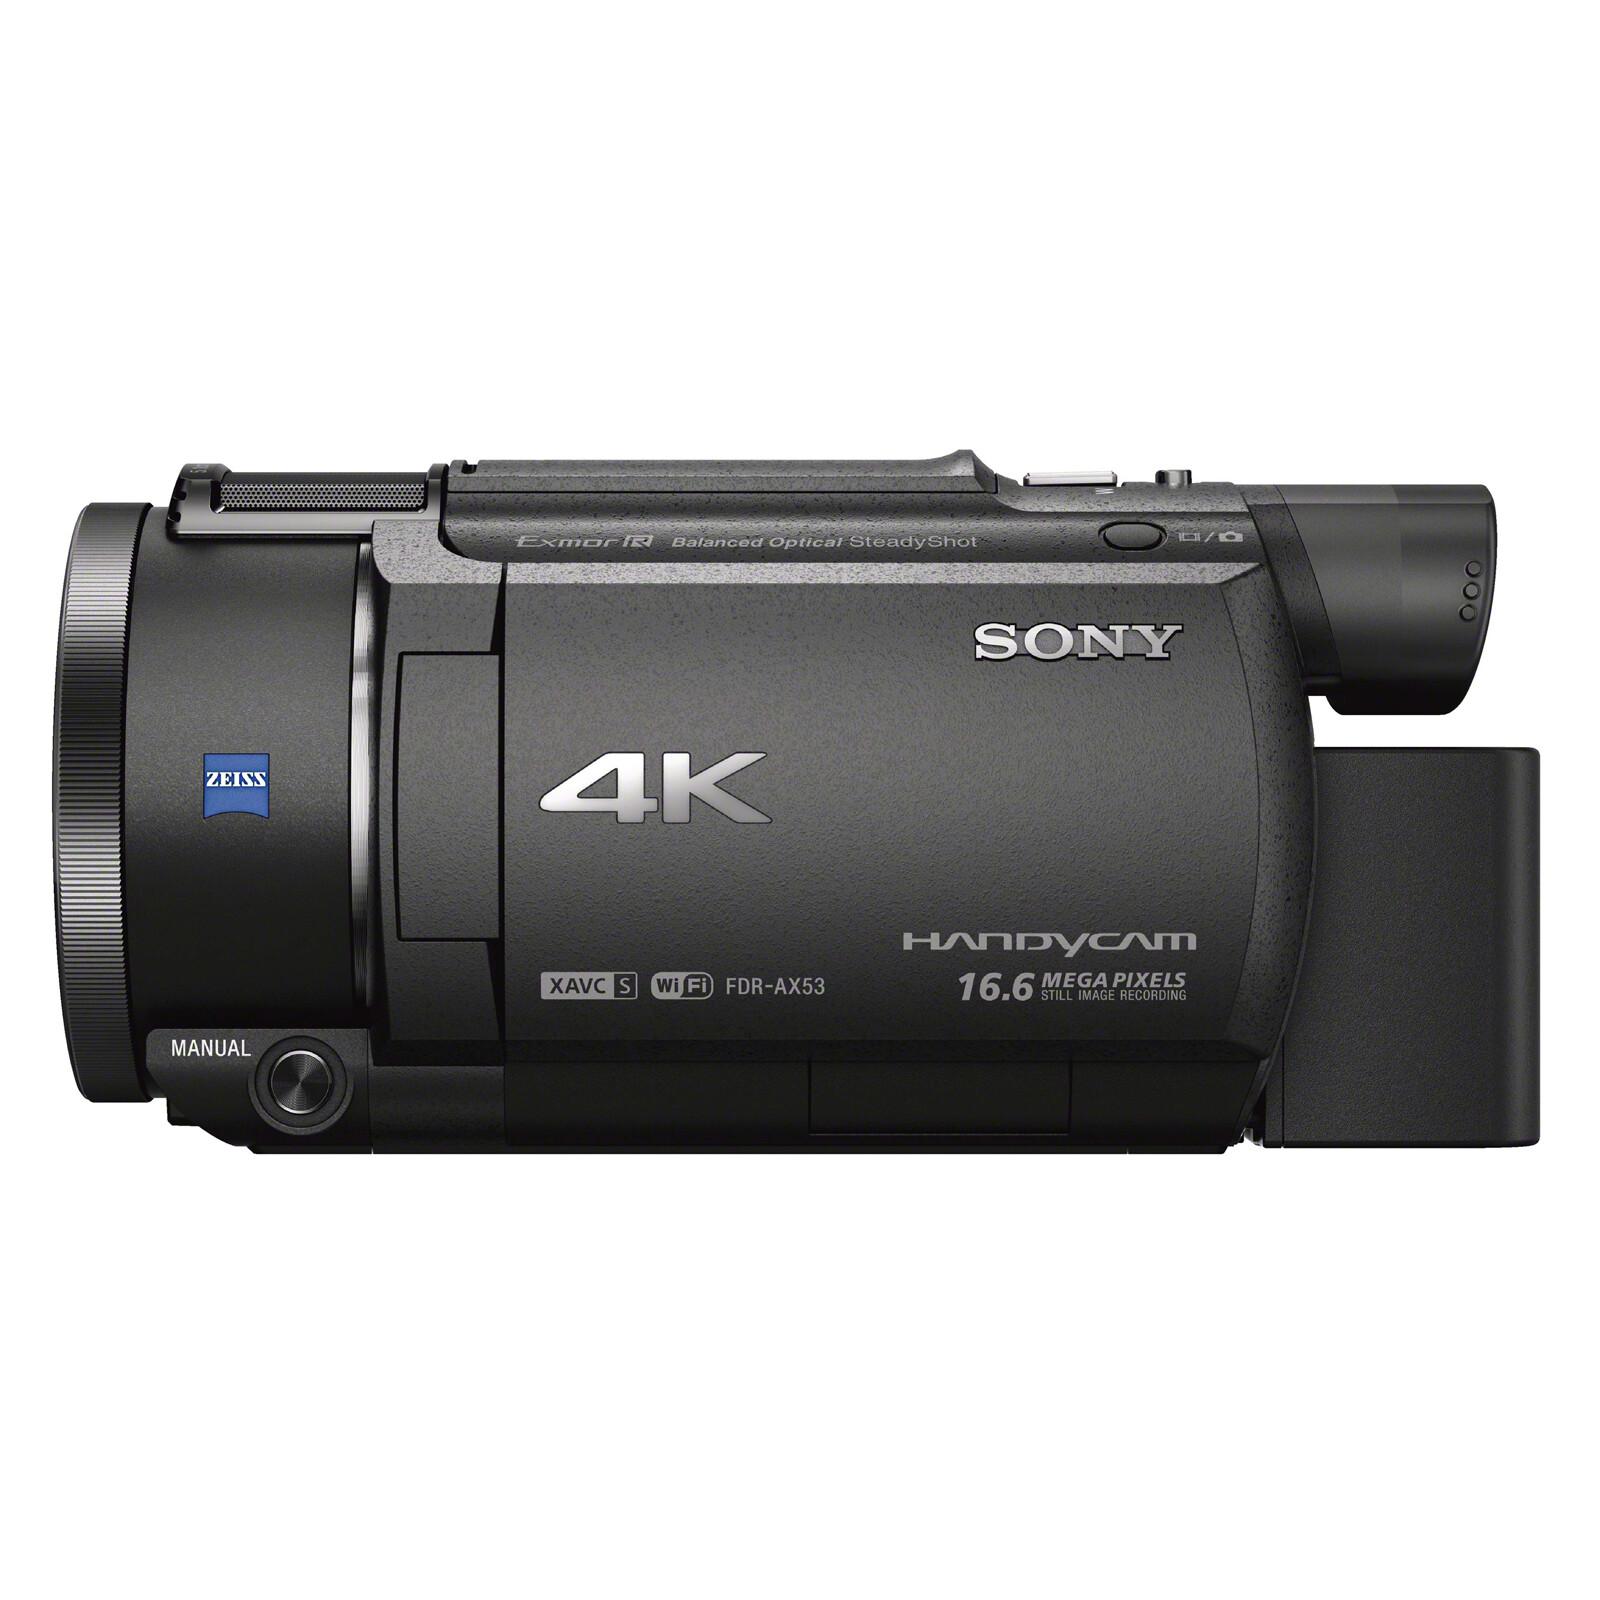 Sony FDR-AX53B 4K Camcorder